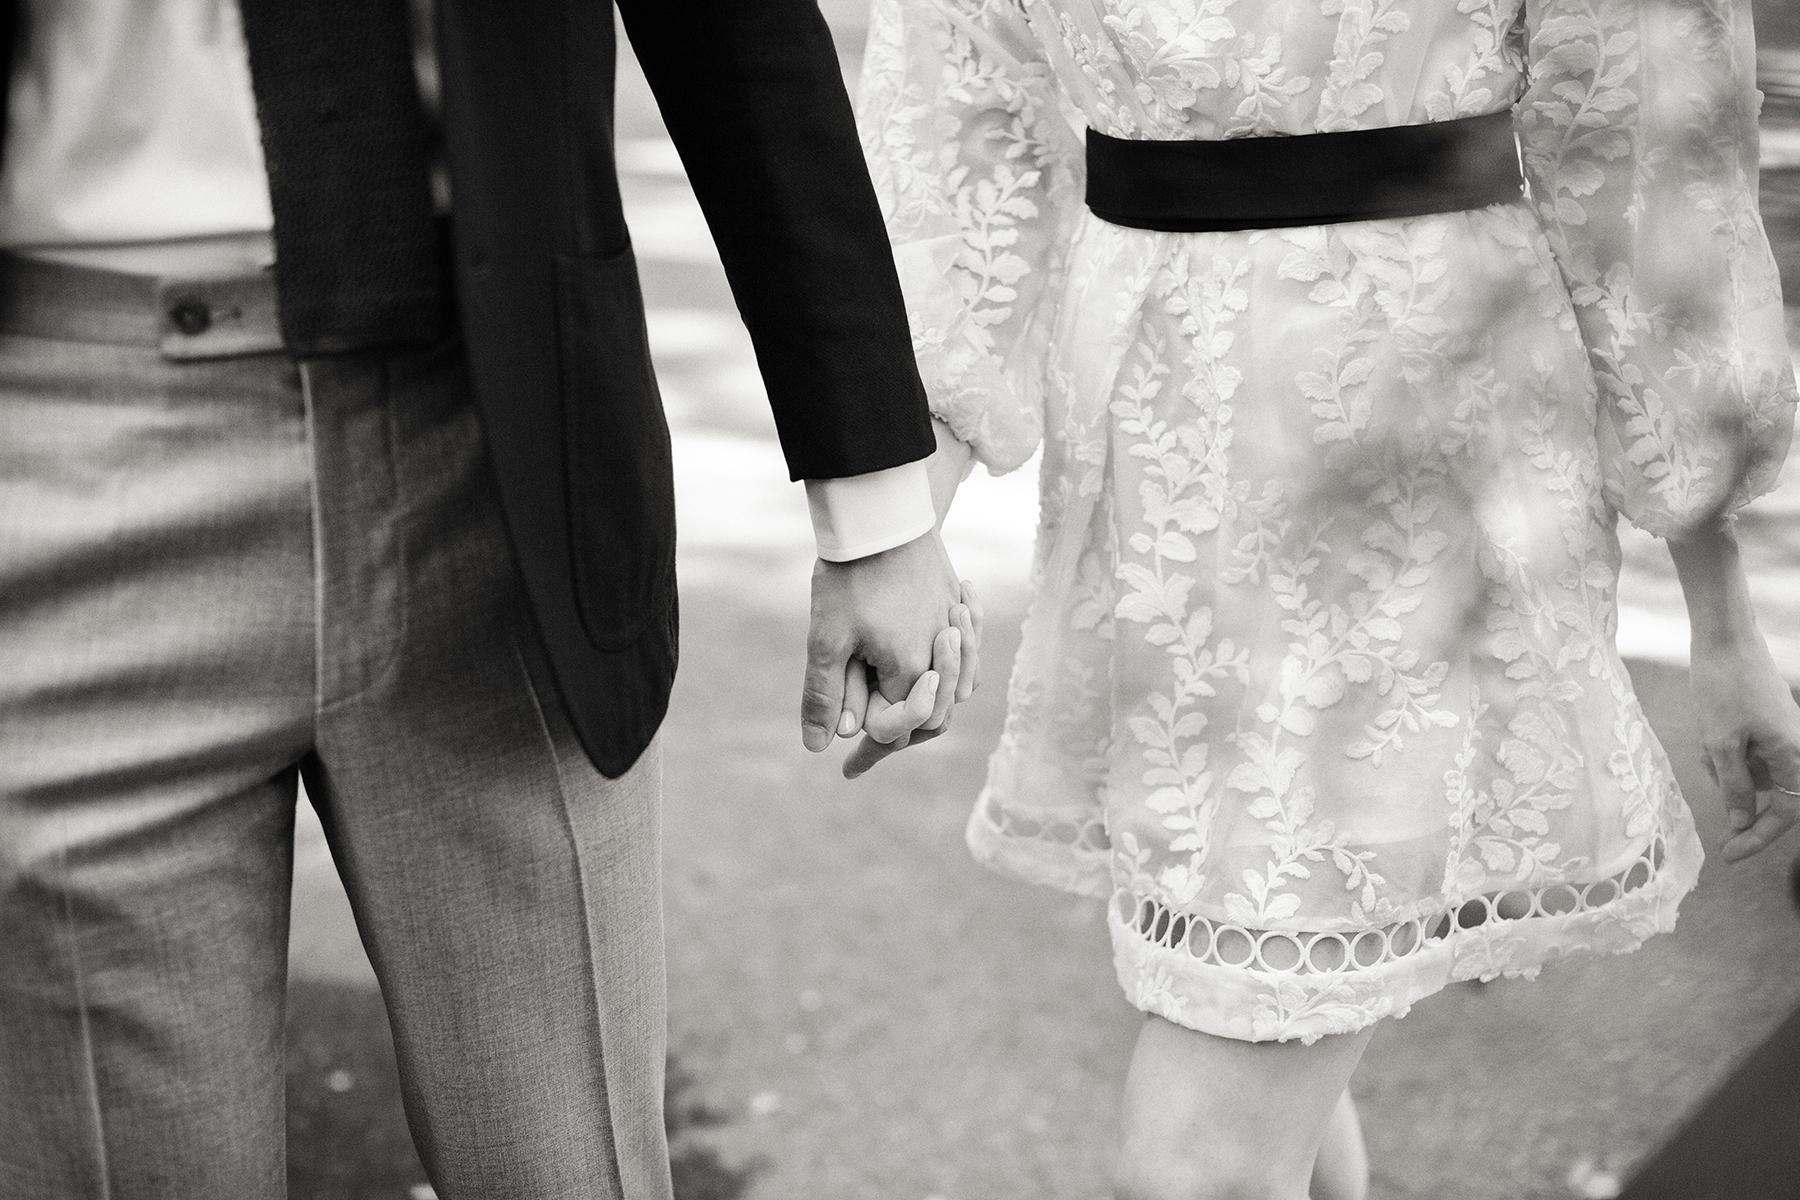 raquelreis_wedding_photography_engagements_022.jpg